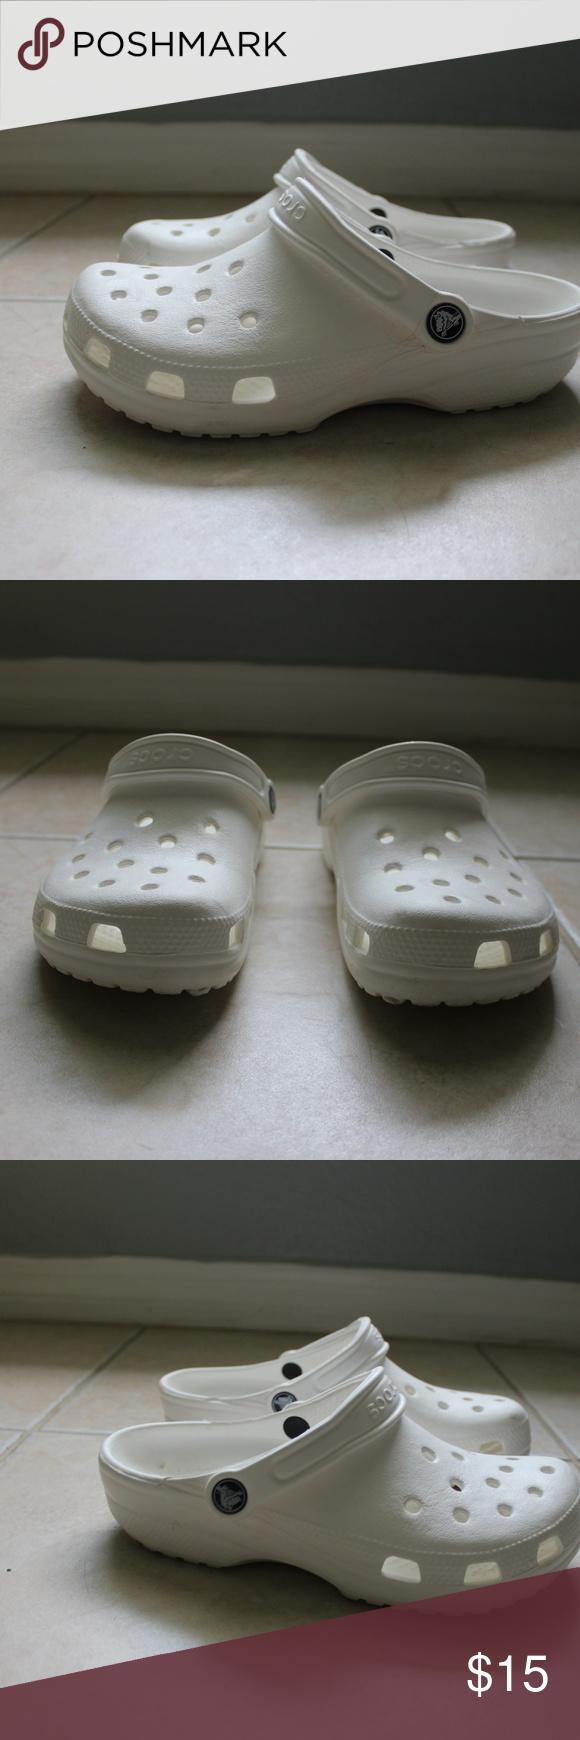 Crocs white classic women's size 7